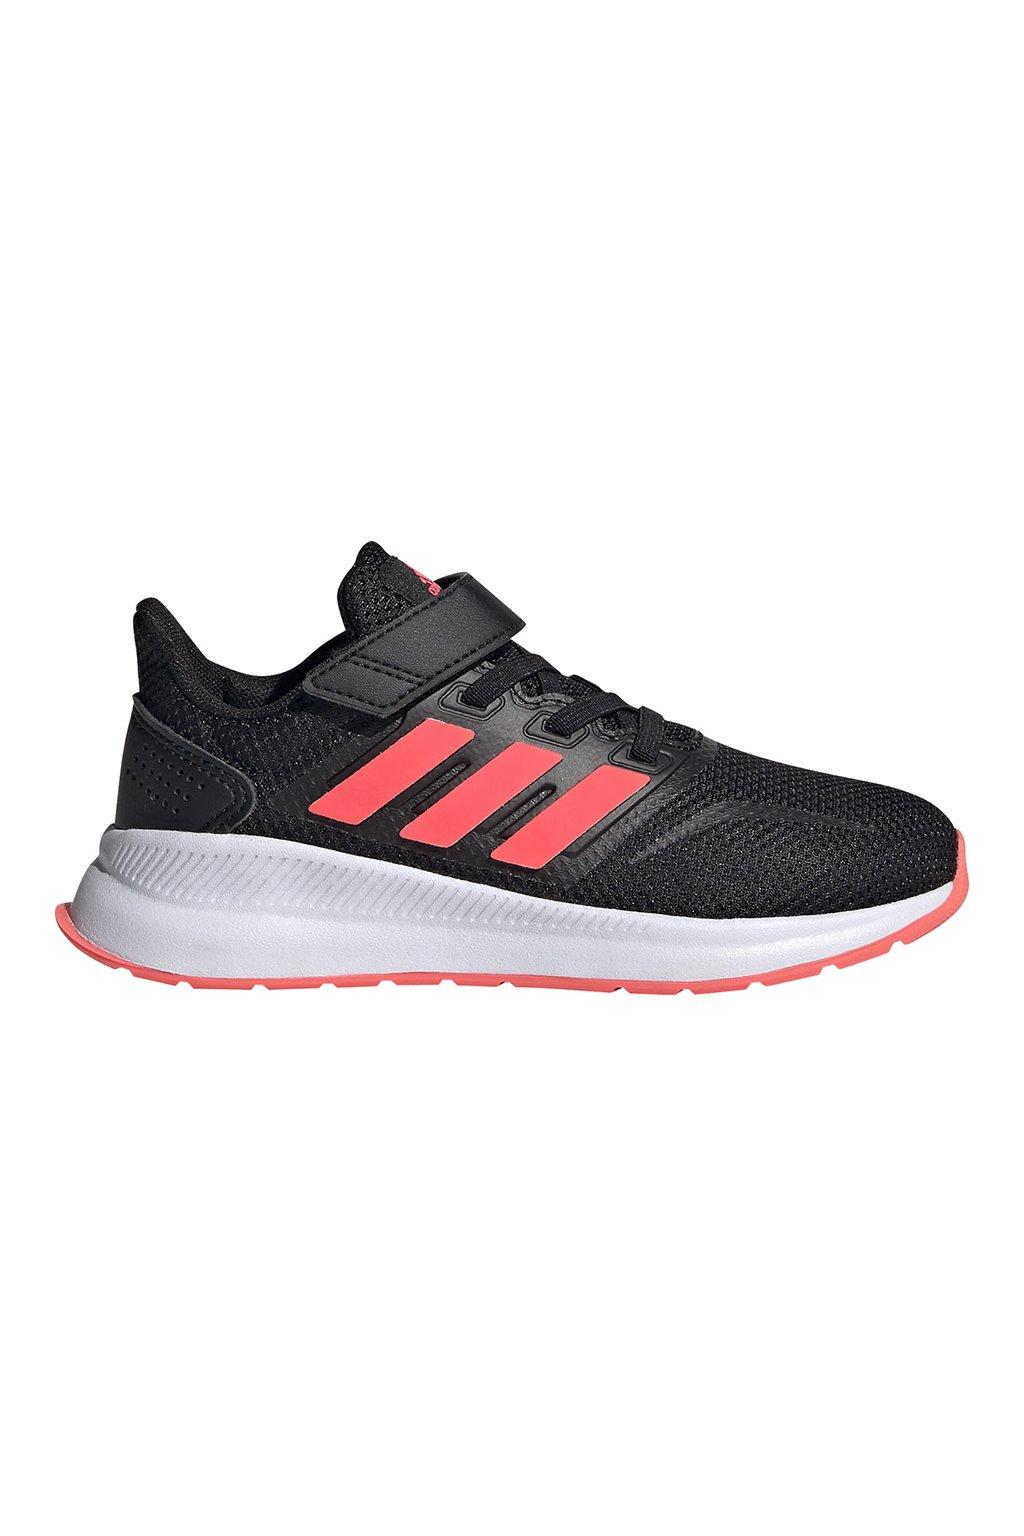 Detská obuv Adidas Runfalcon C čierna FW5138